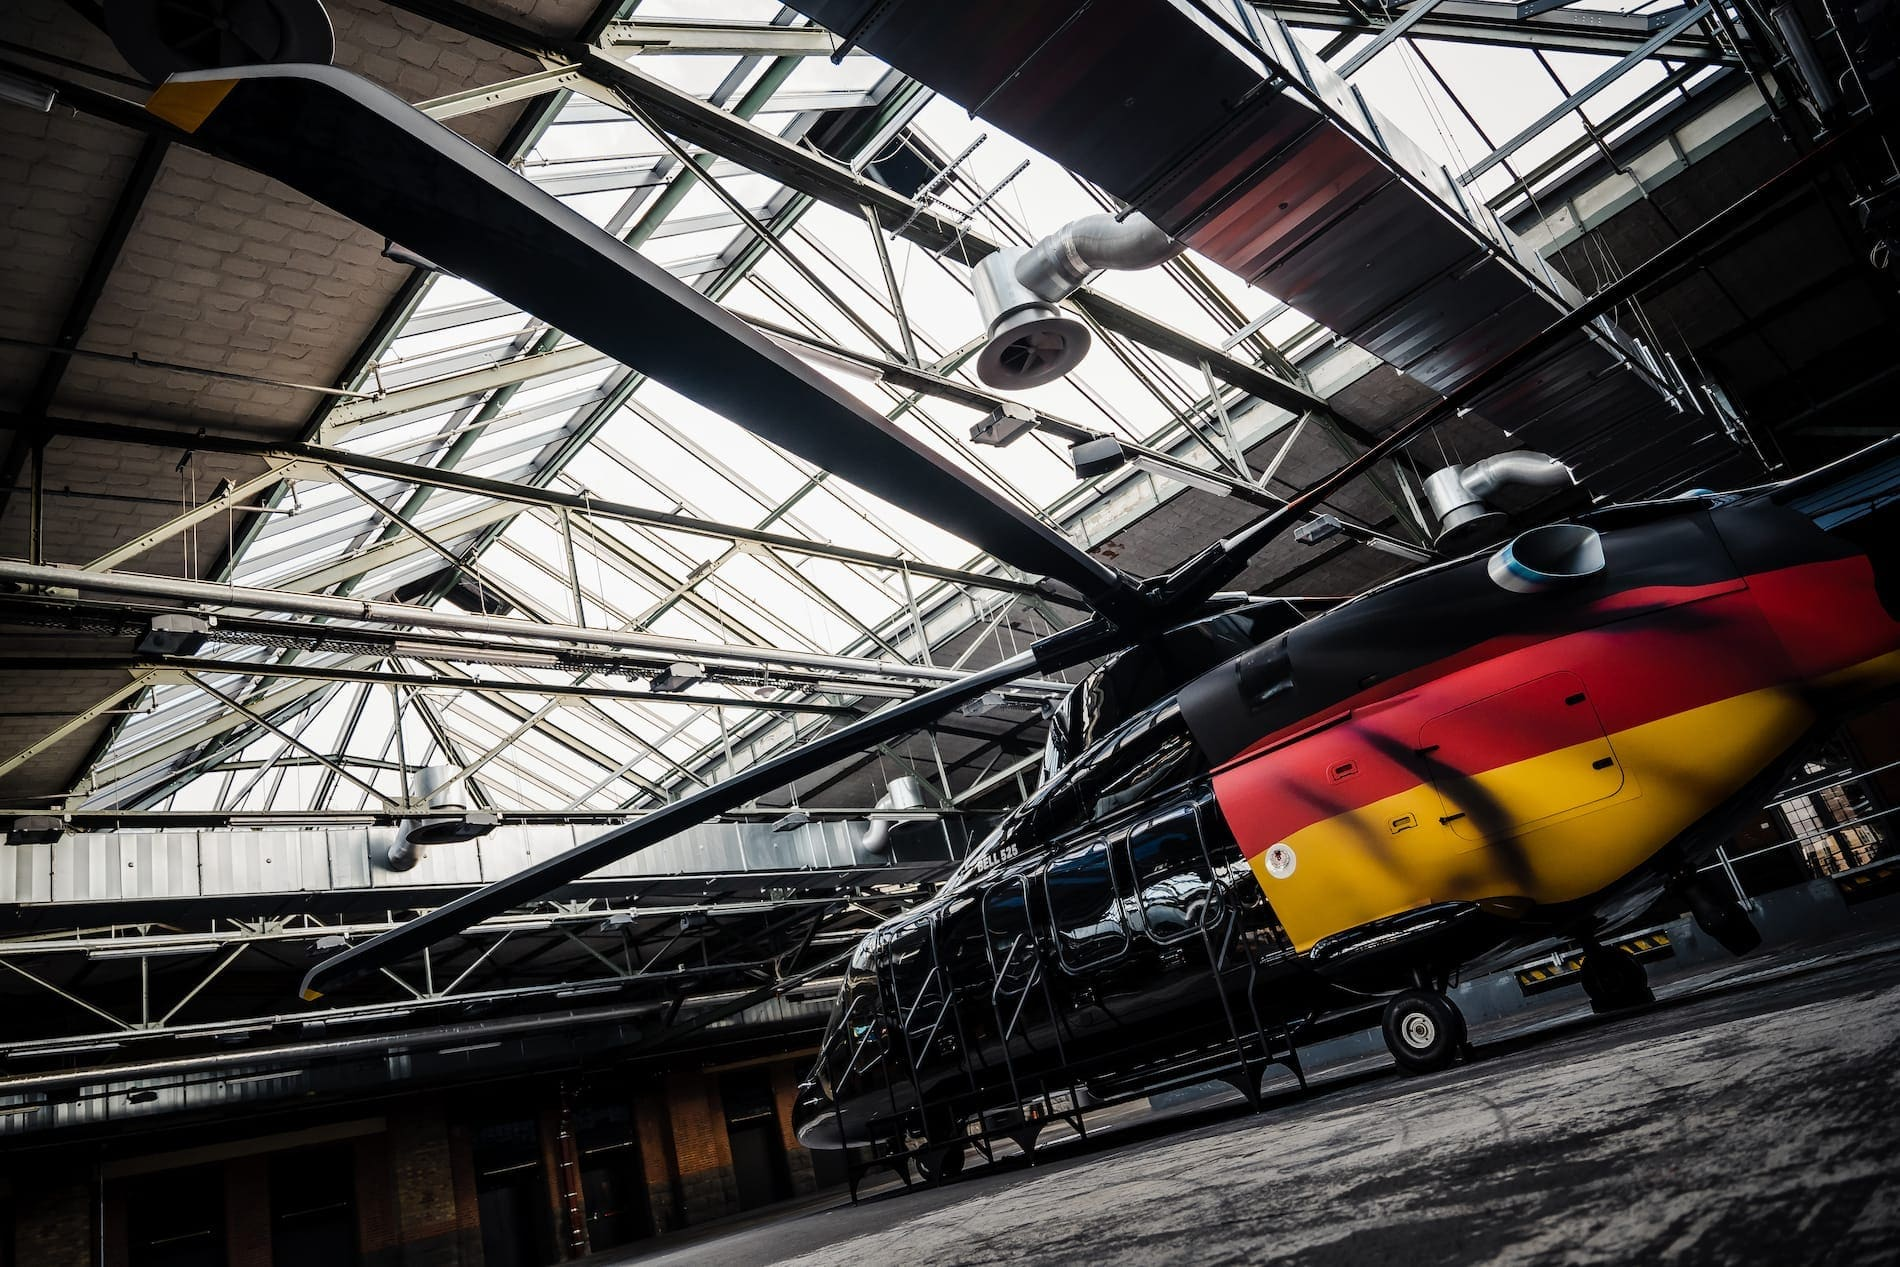 BELL_525_Germany-15